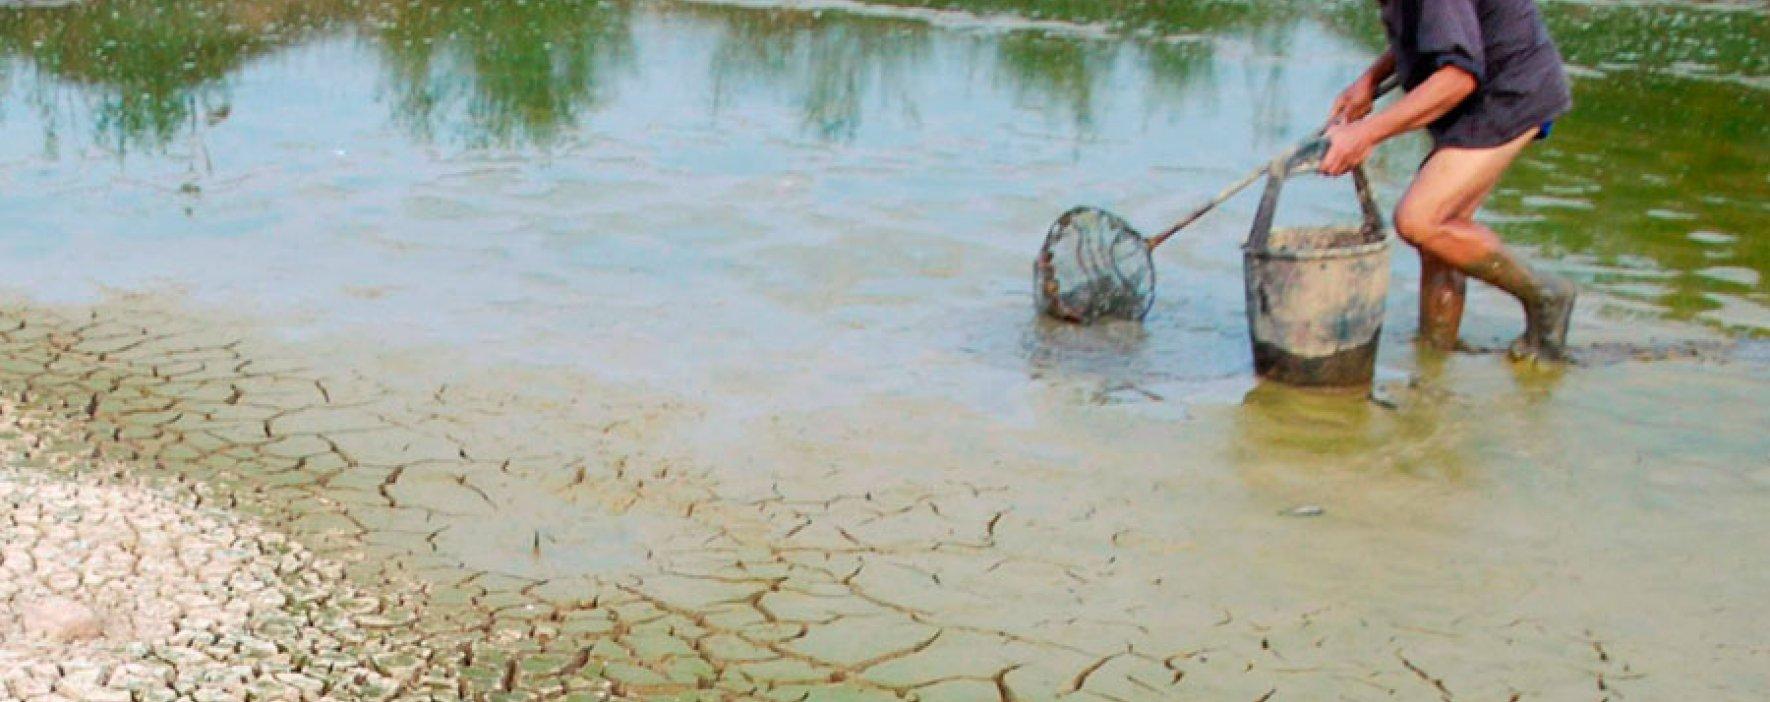 Municipios de Colombia en riesgo por cambio climático